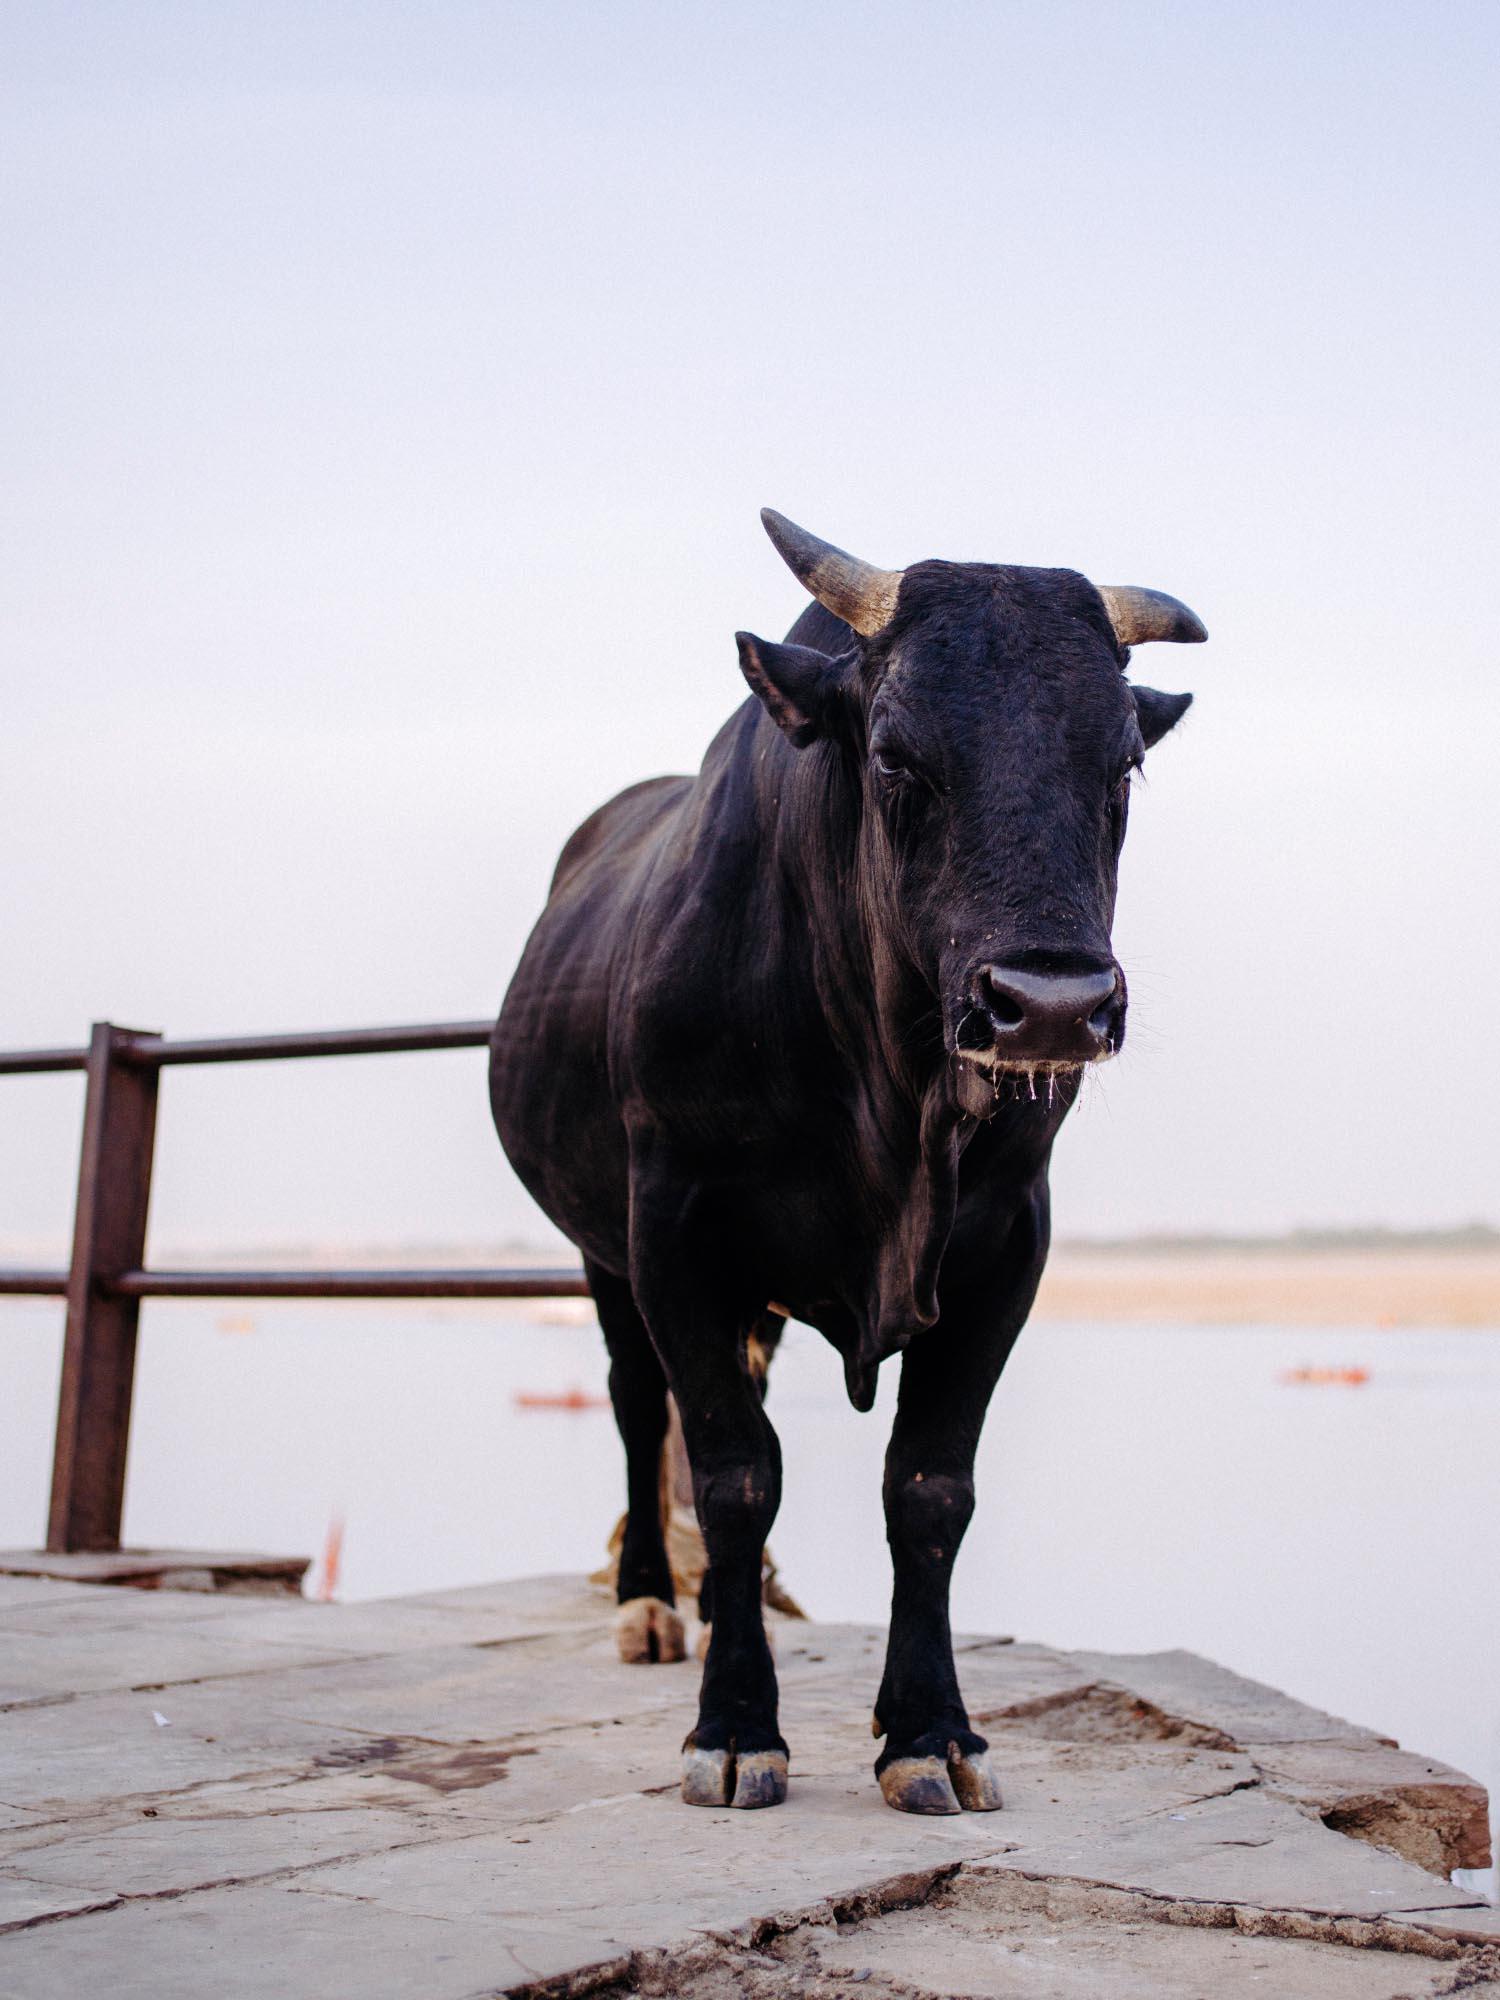 One of many bulls.